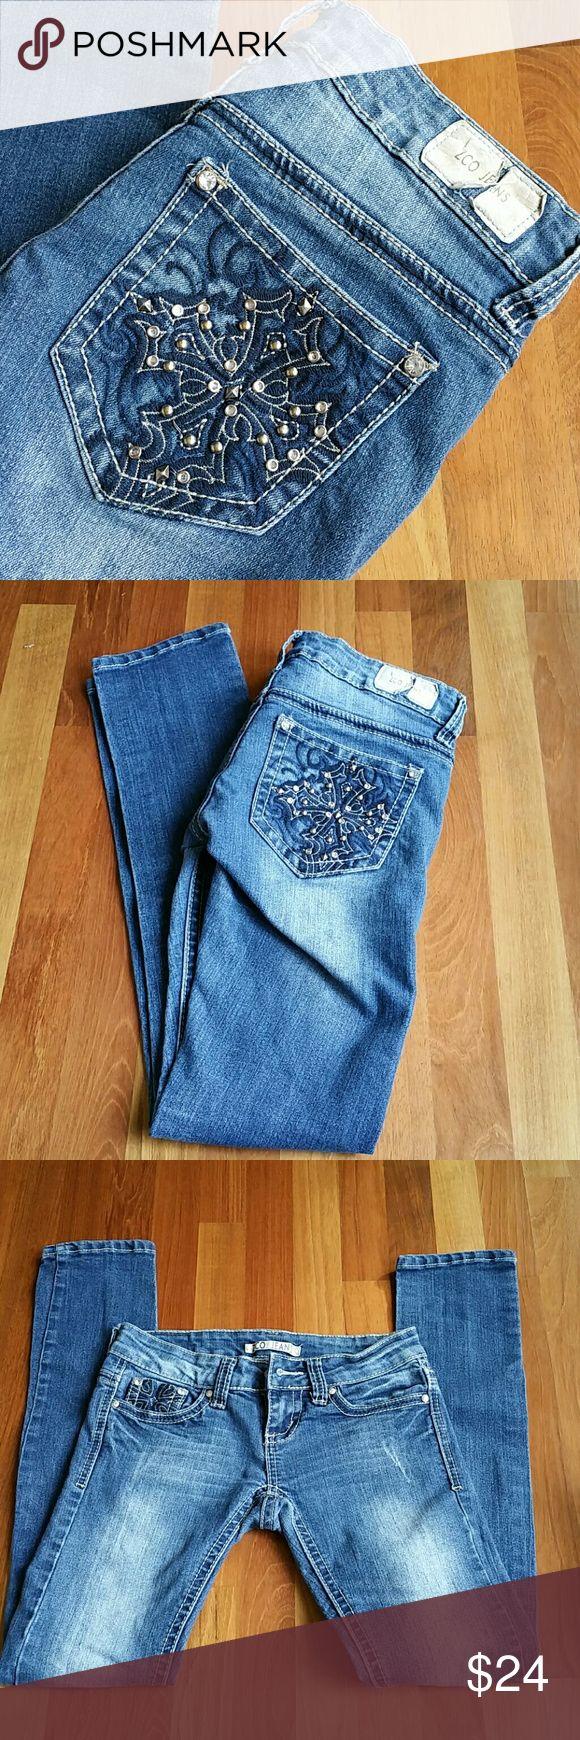 ZCO Jeans Super cute. ZCO Jeans Skinny